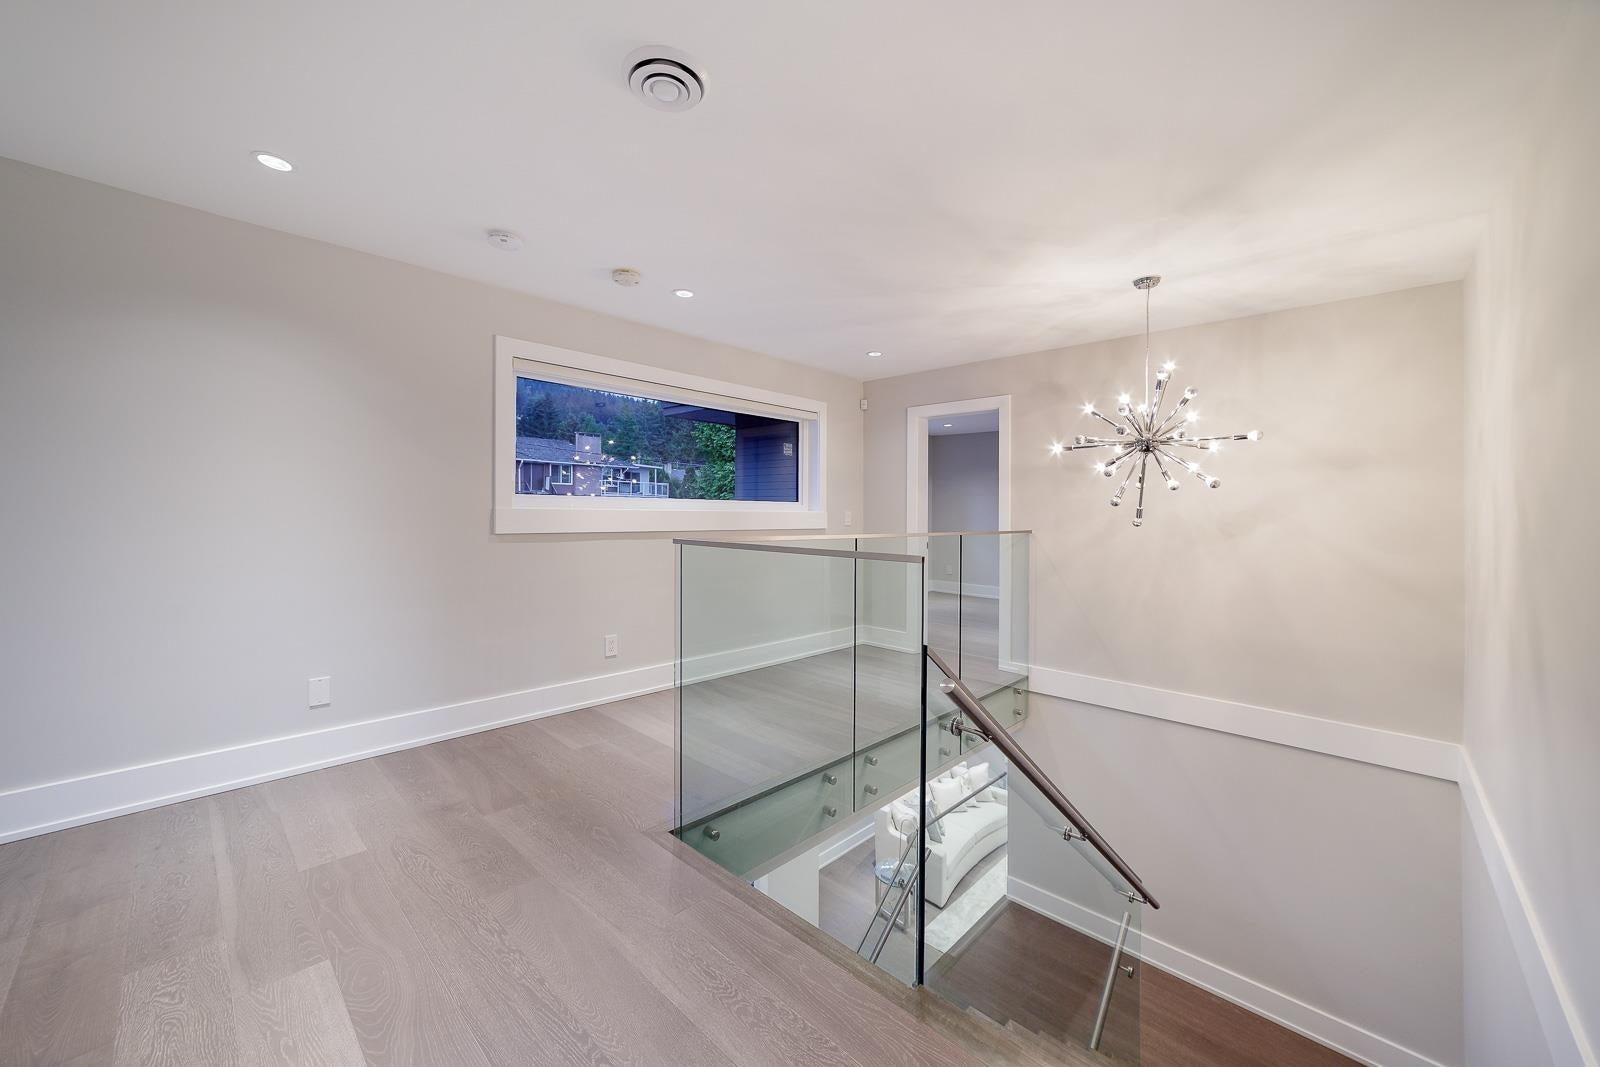 517 GRANADA CRESCENT - Upper Delbrook House/Single Family for sale, 8 Bedrooms (R2615057) - #14